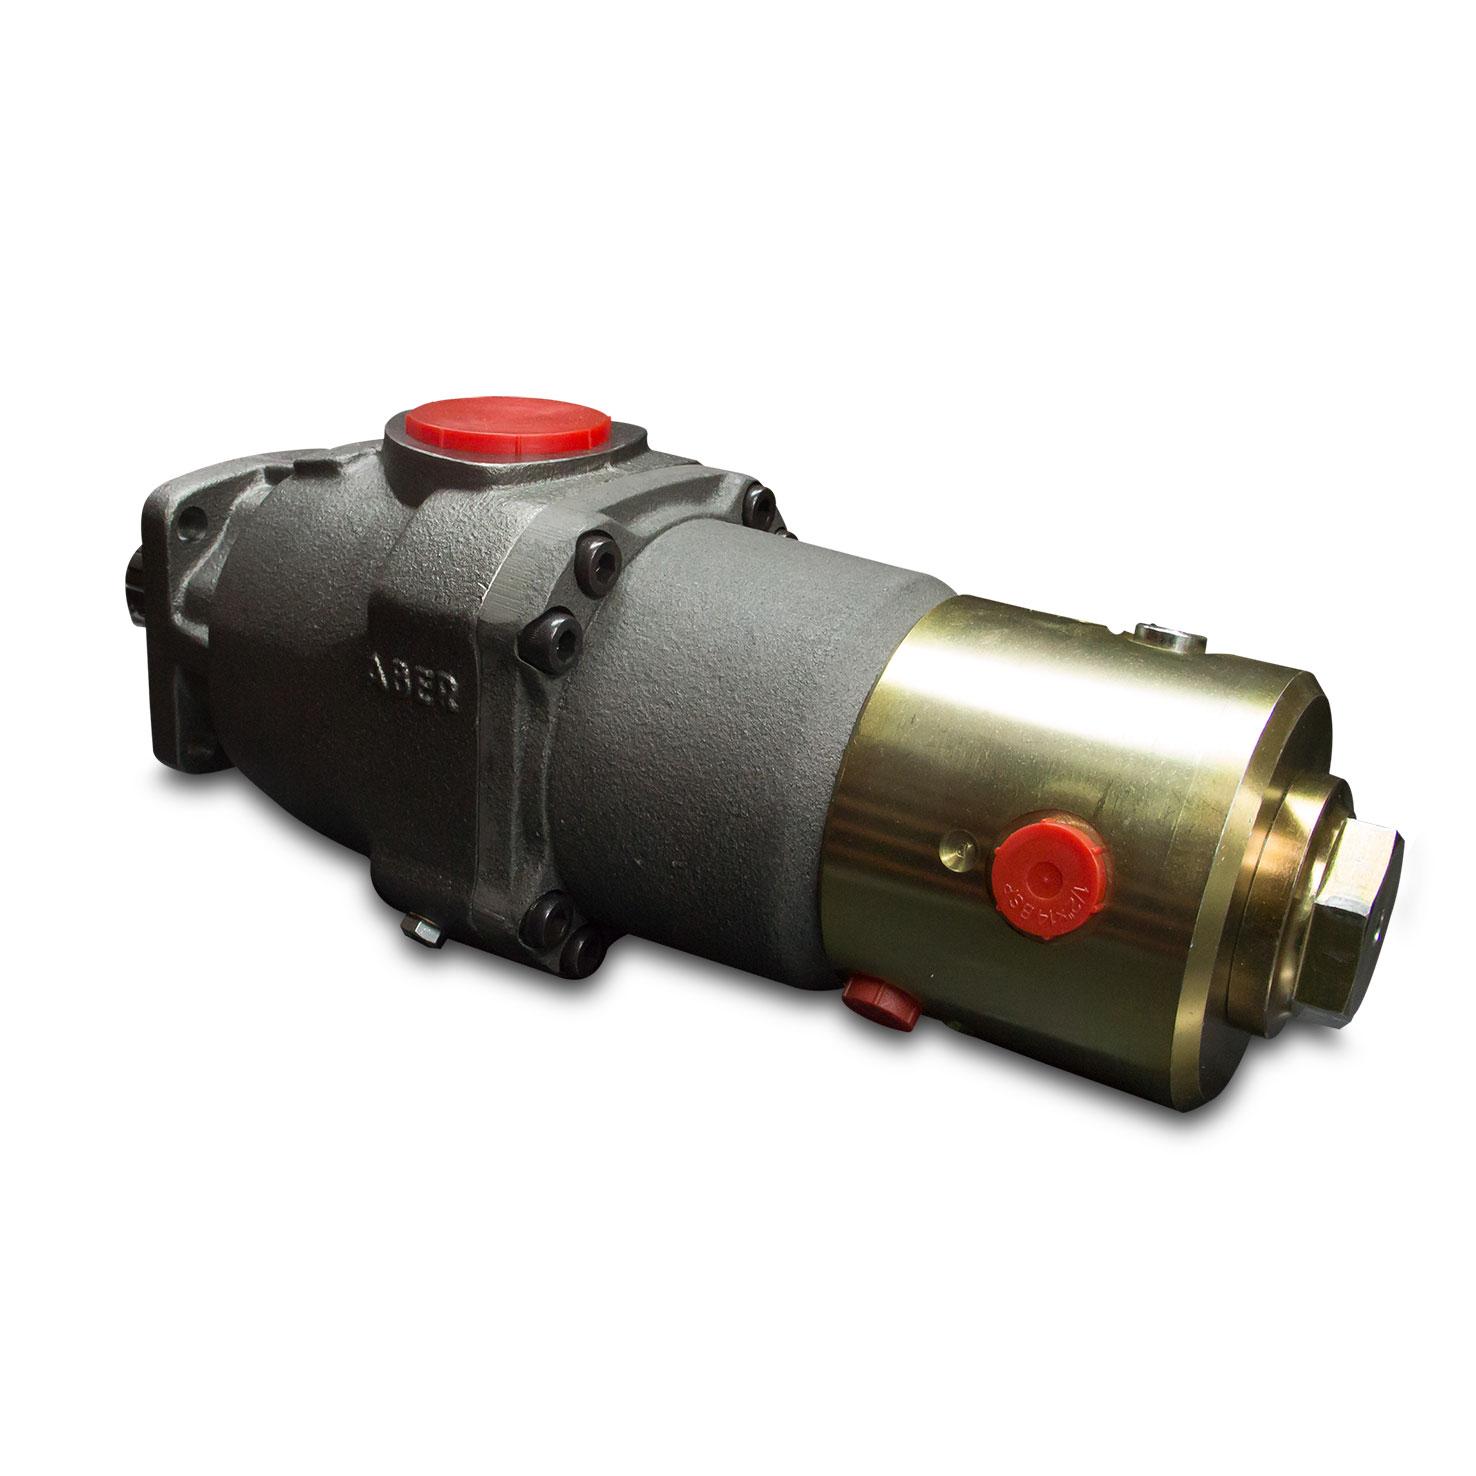 customized piston pump by ABER